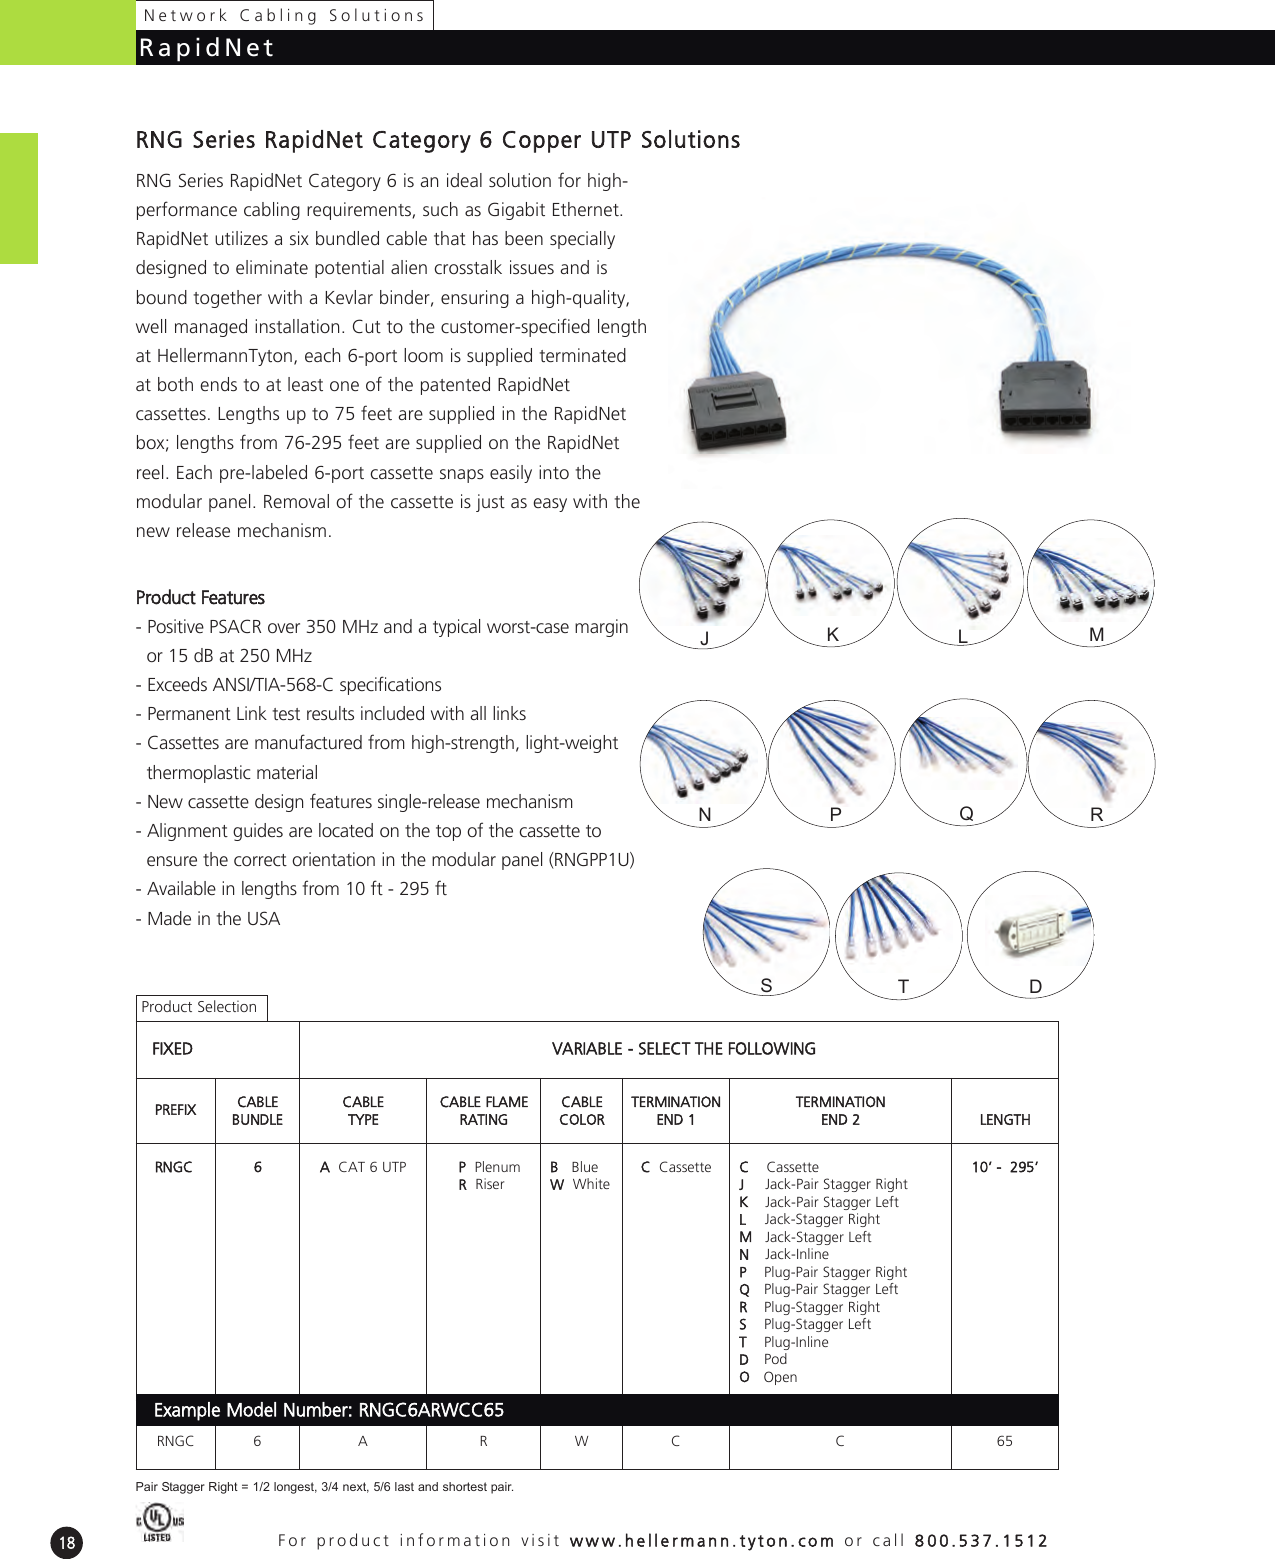 PCYEL10 Pack of 10 CABLE MOD 8P8C PLUG-PLUG 10